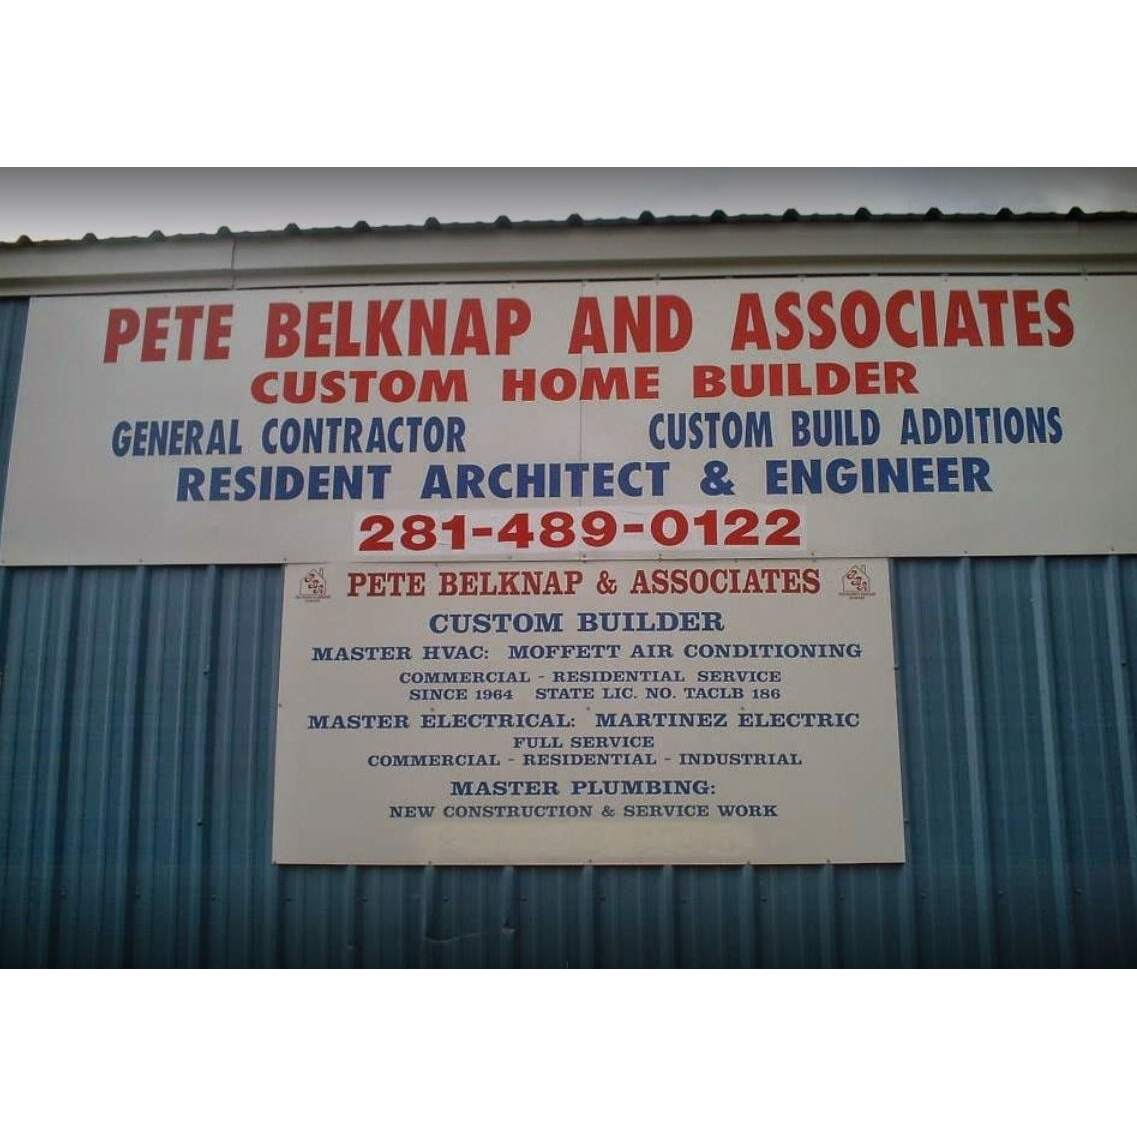 Pete Belknap & Associates